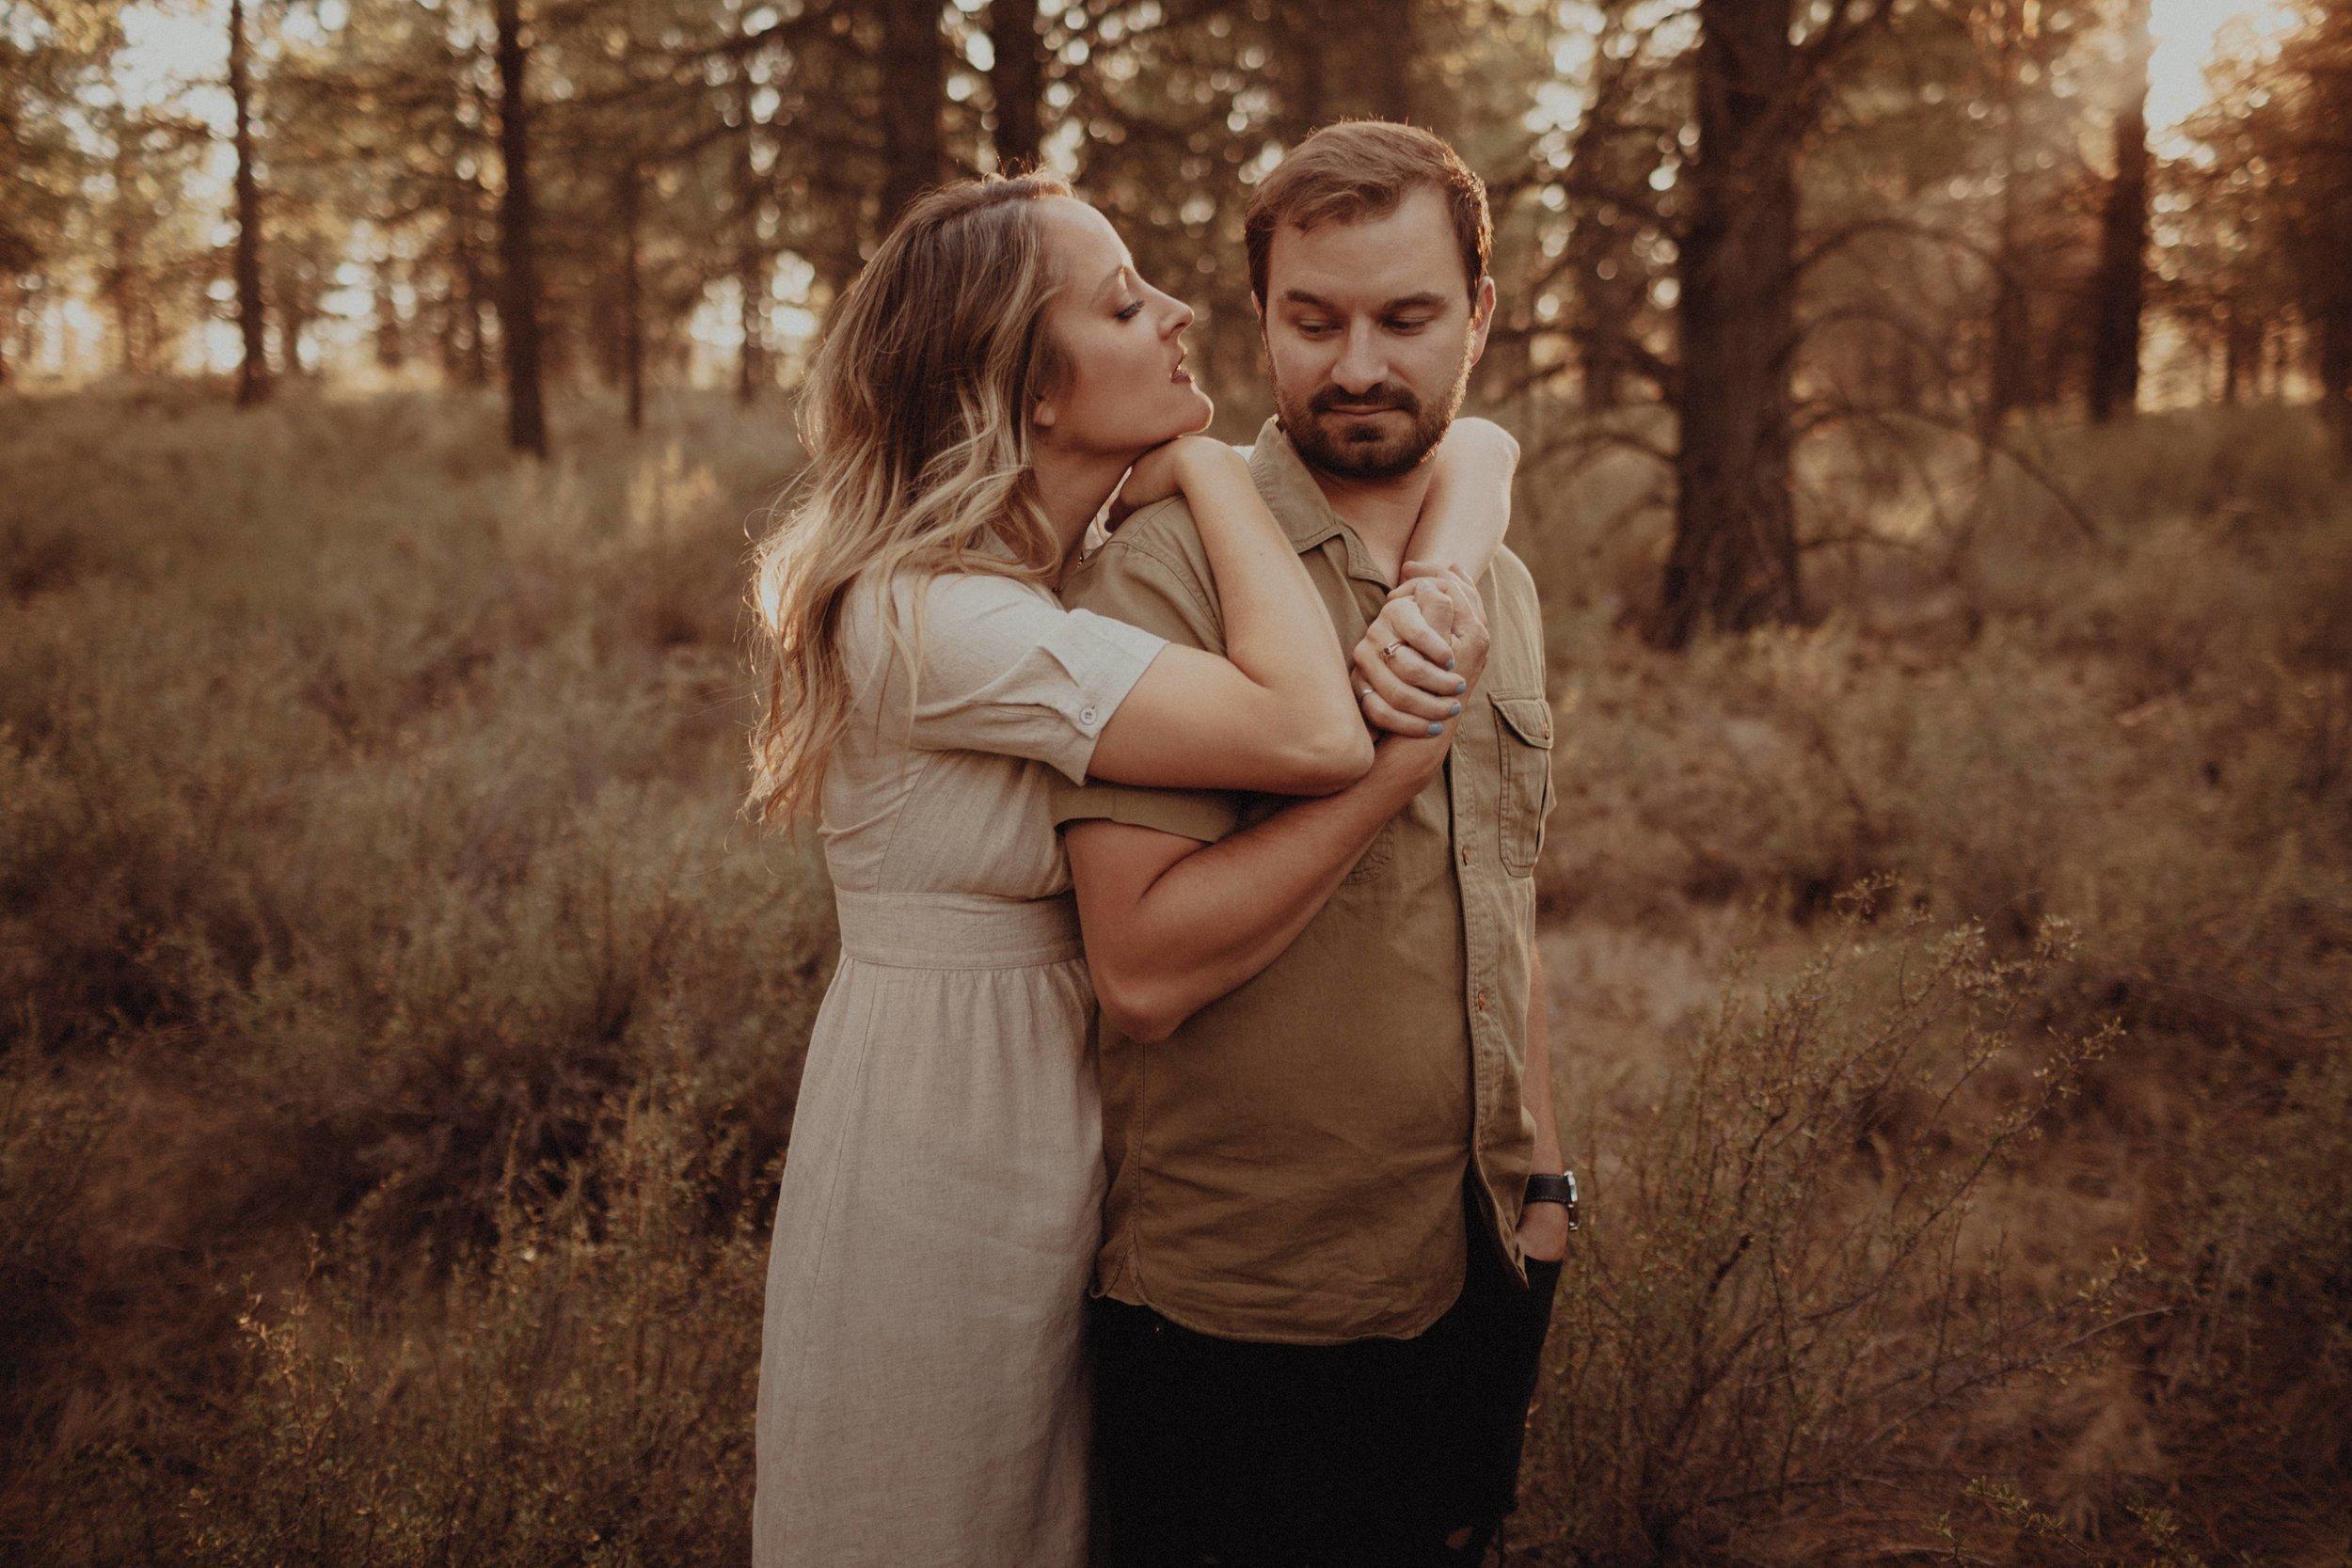 Dillon Falls Couple Shoot.Lauren Apel Photo19.JPG